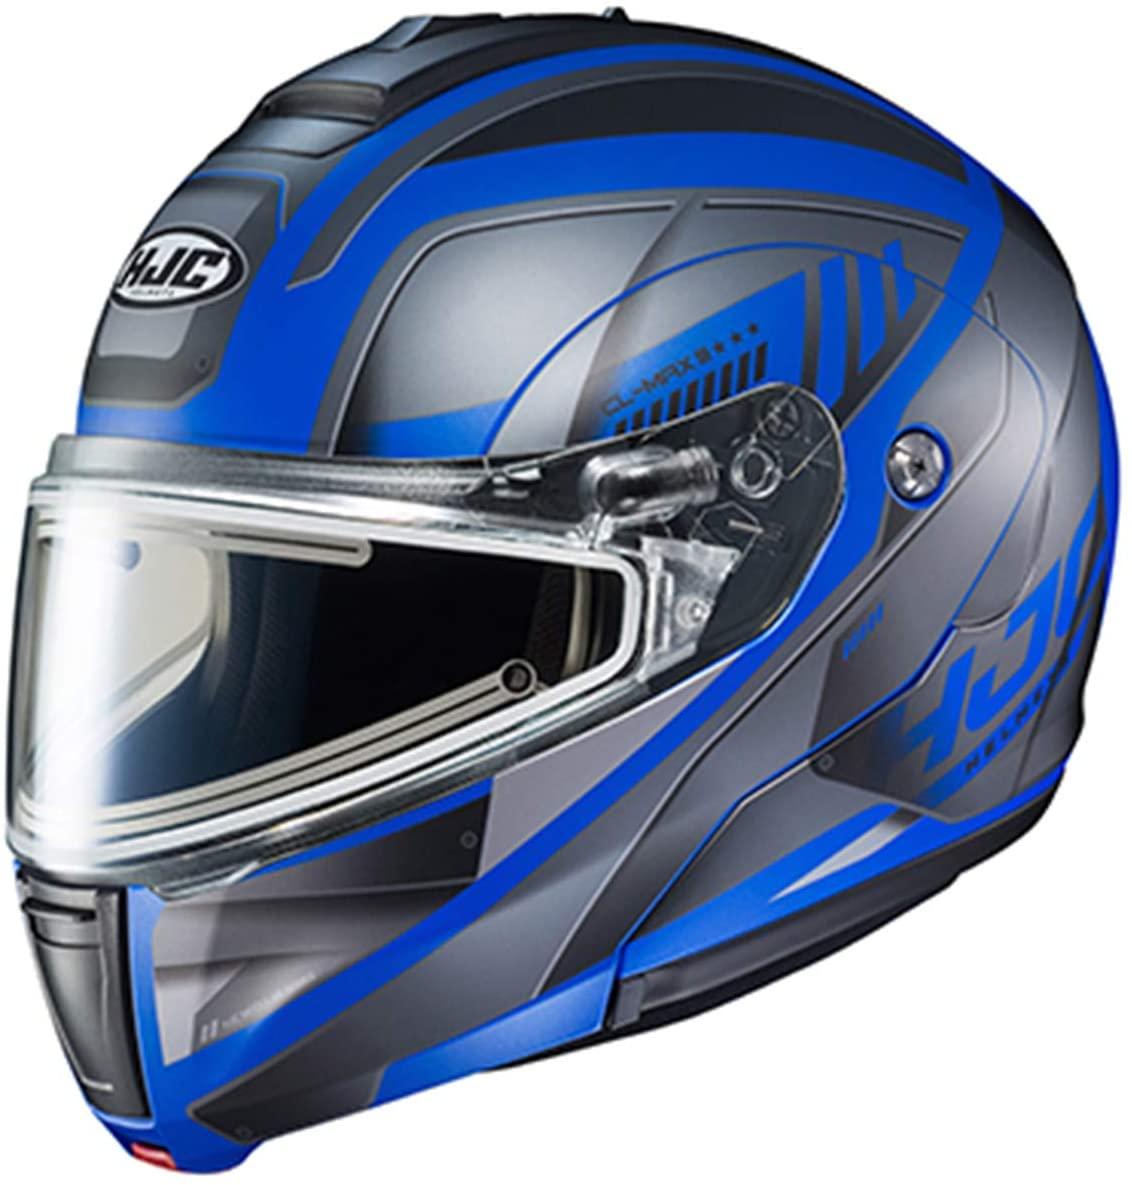 HJC CL-Max 3 Gallant Adult Snowmobile Helmet with Electric Shield - MC-2SF / Medium